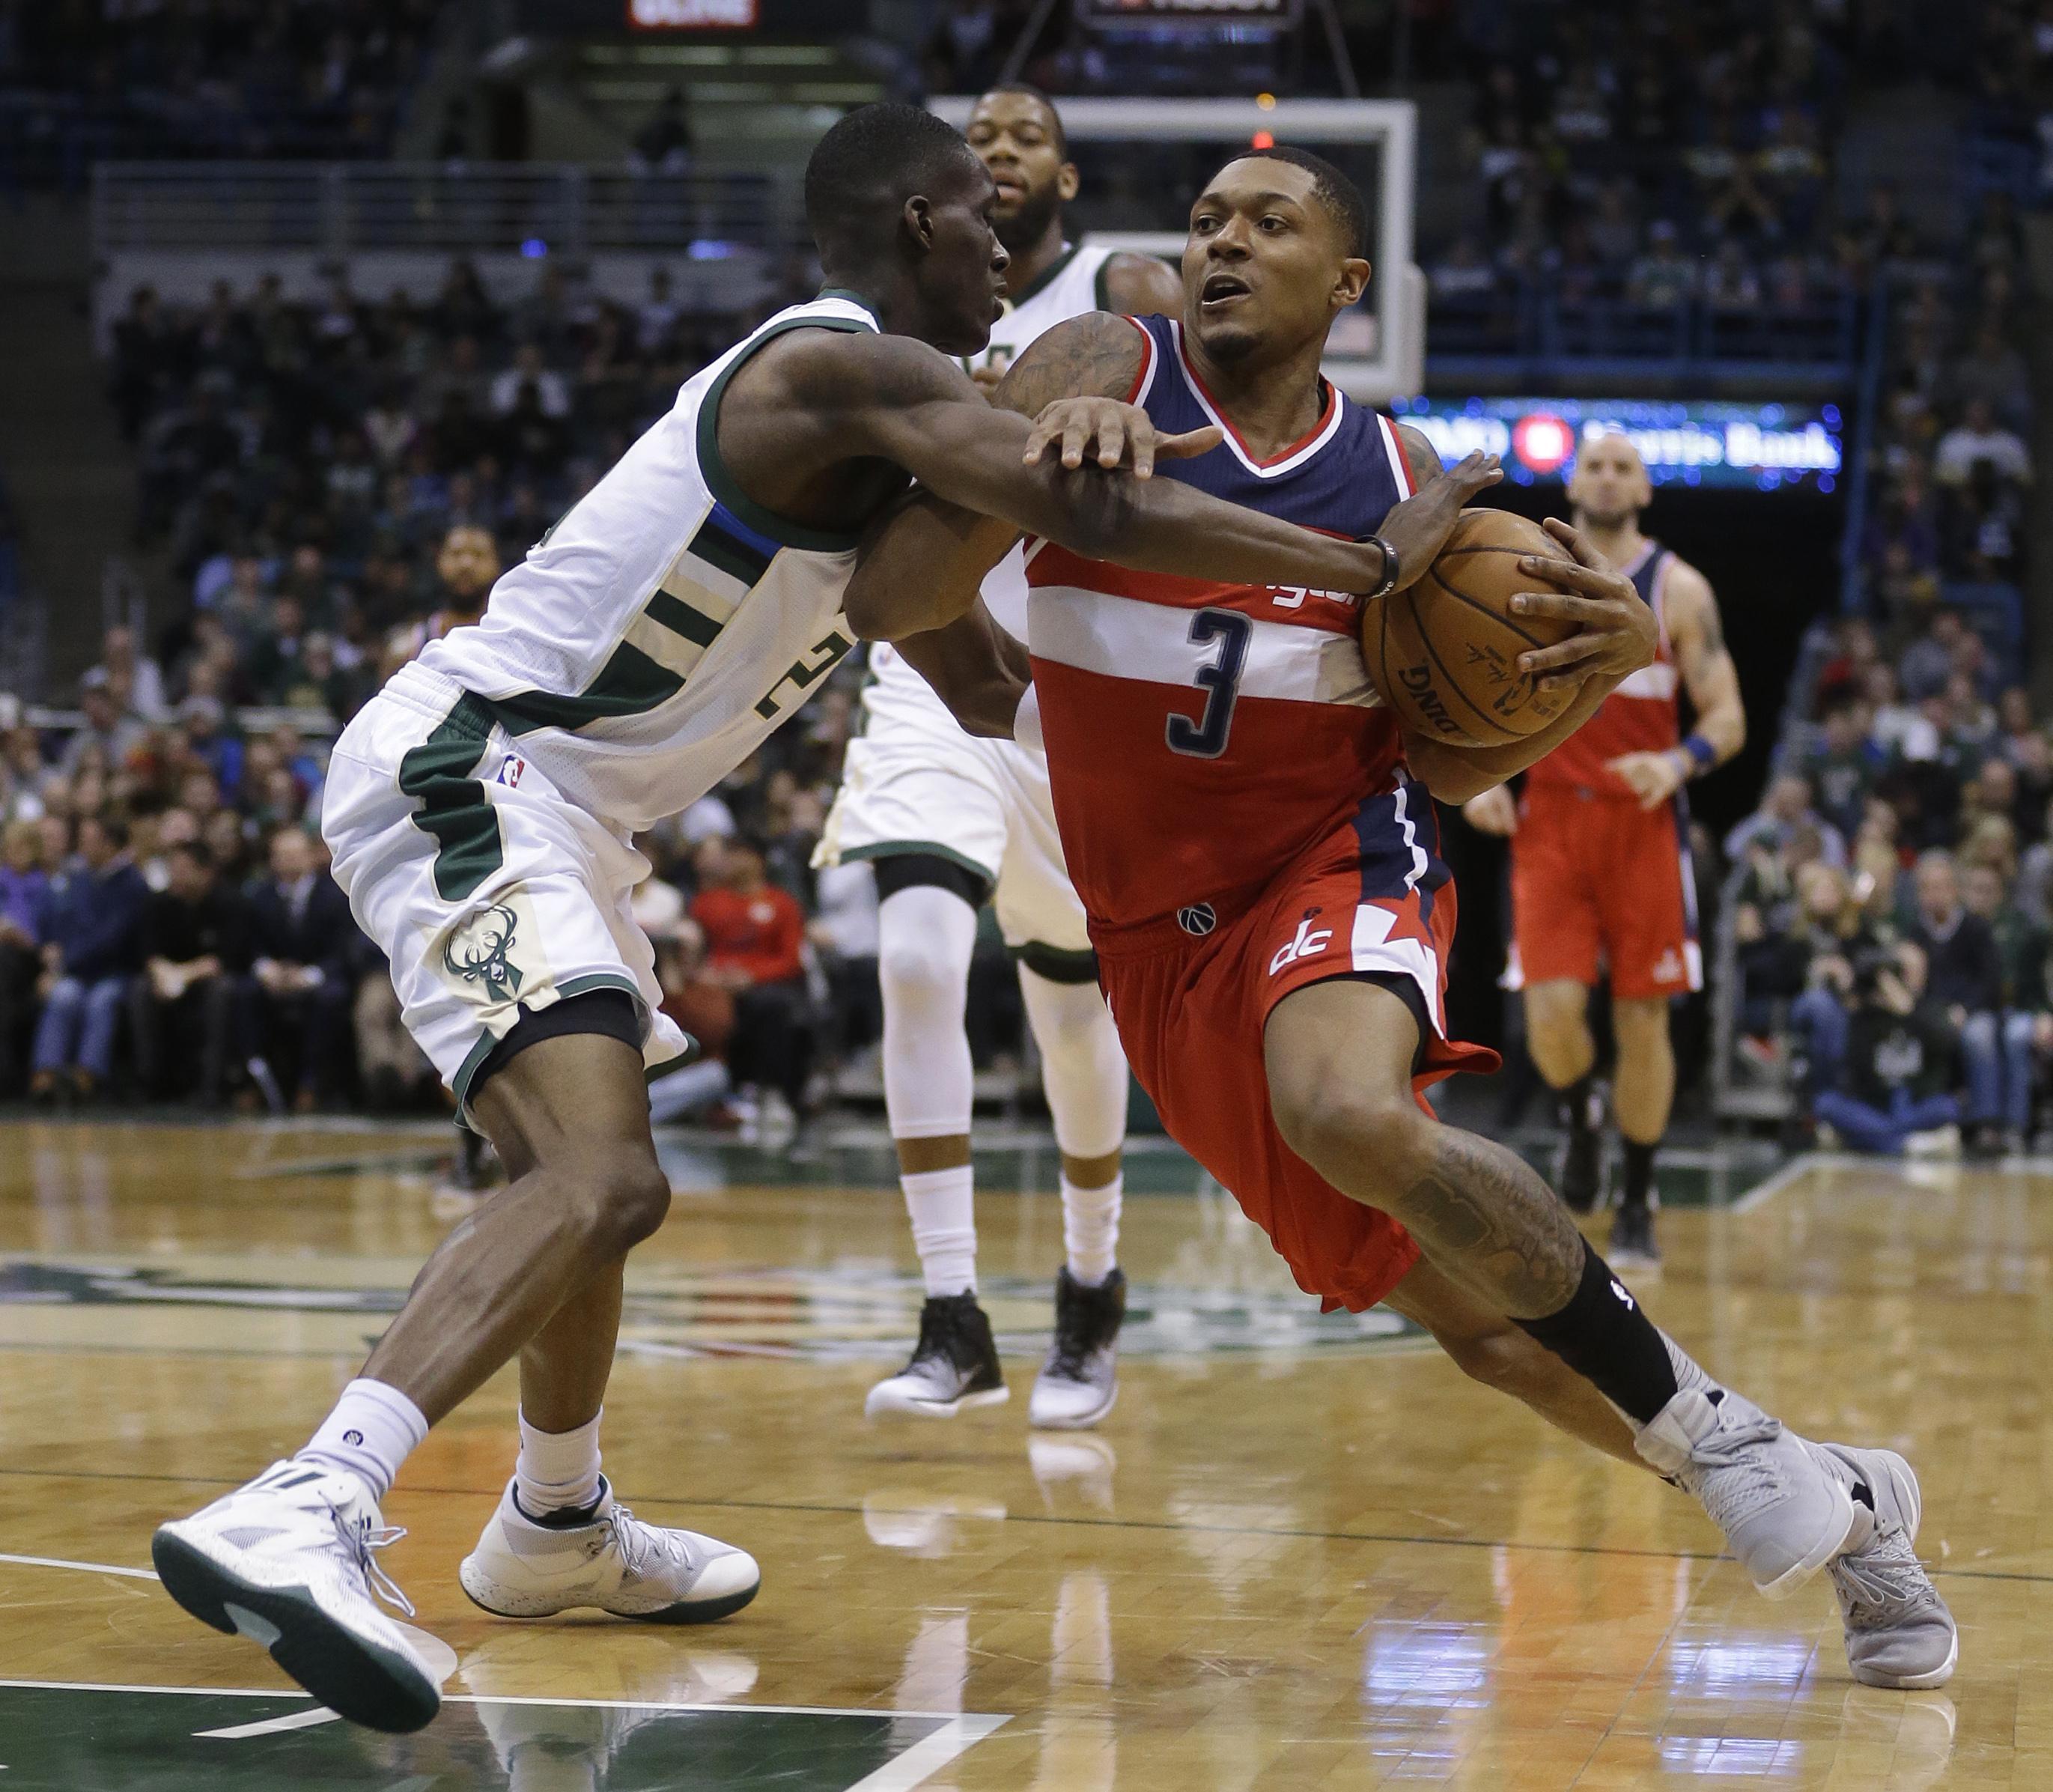 Wizards_bucks_basketball_49193